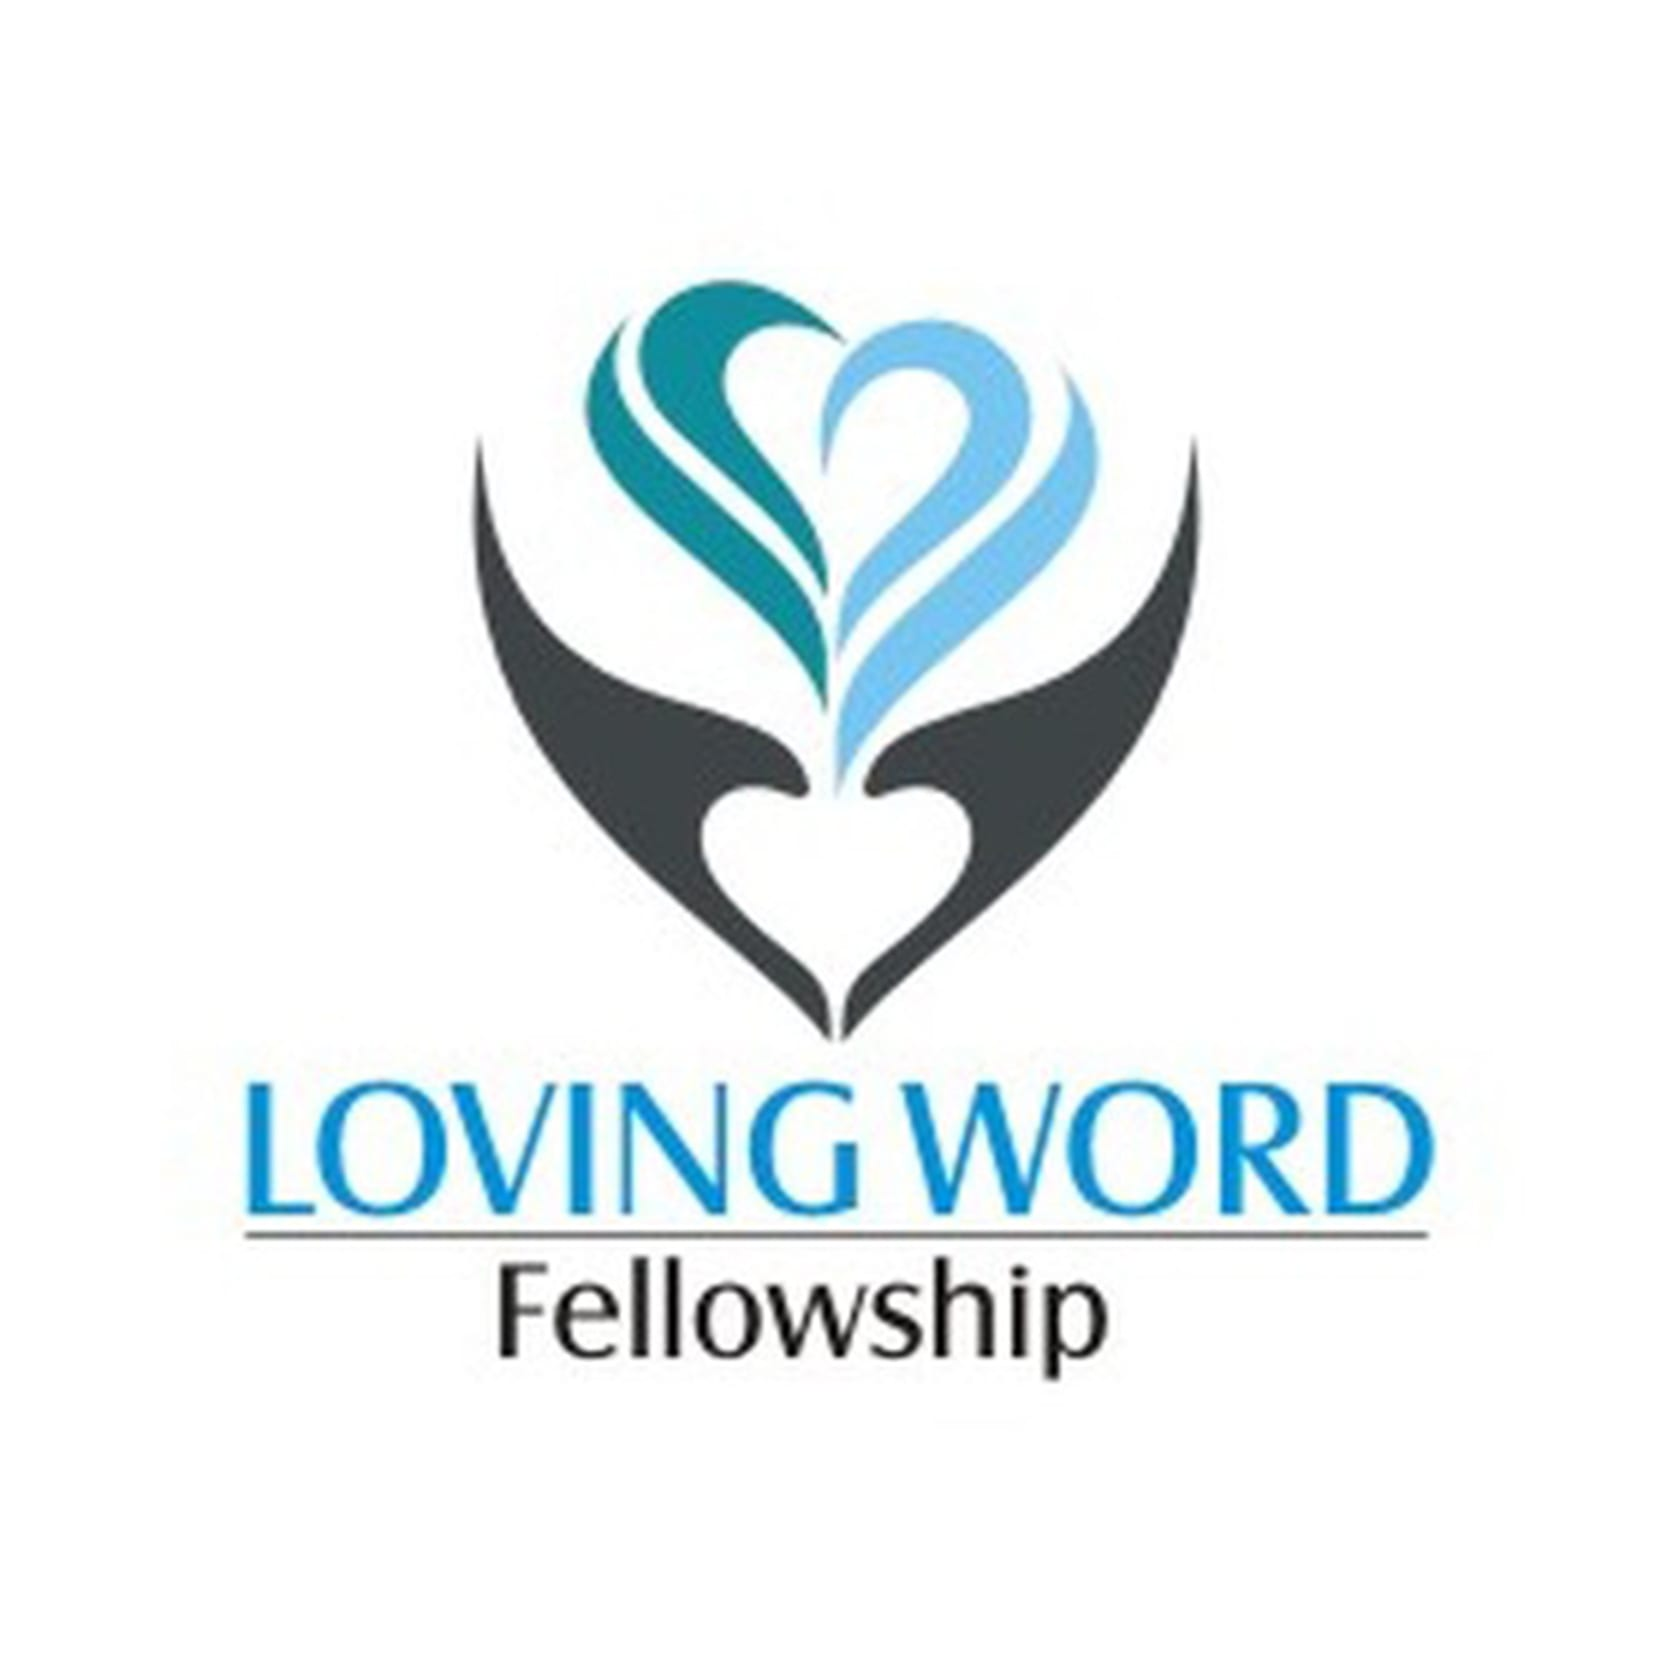 lovingwood fellowship logo